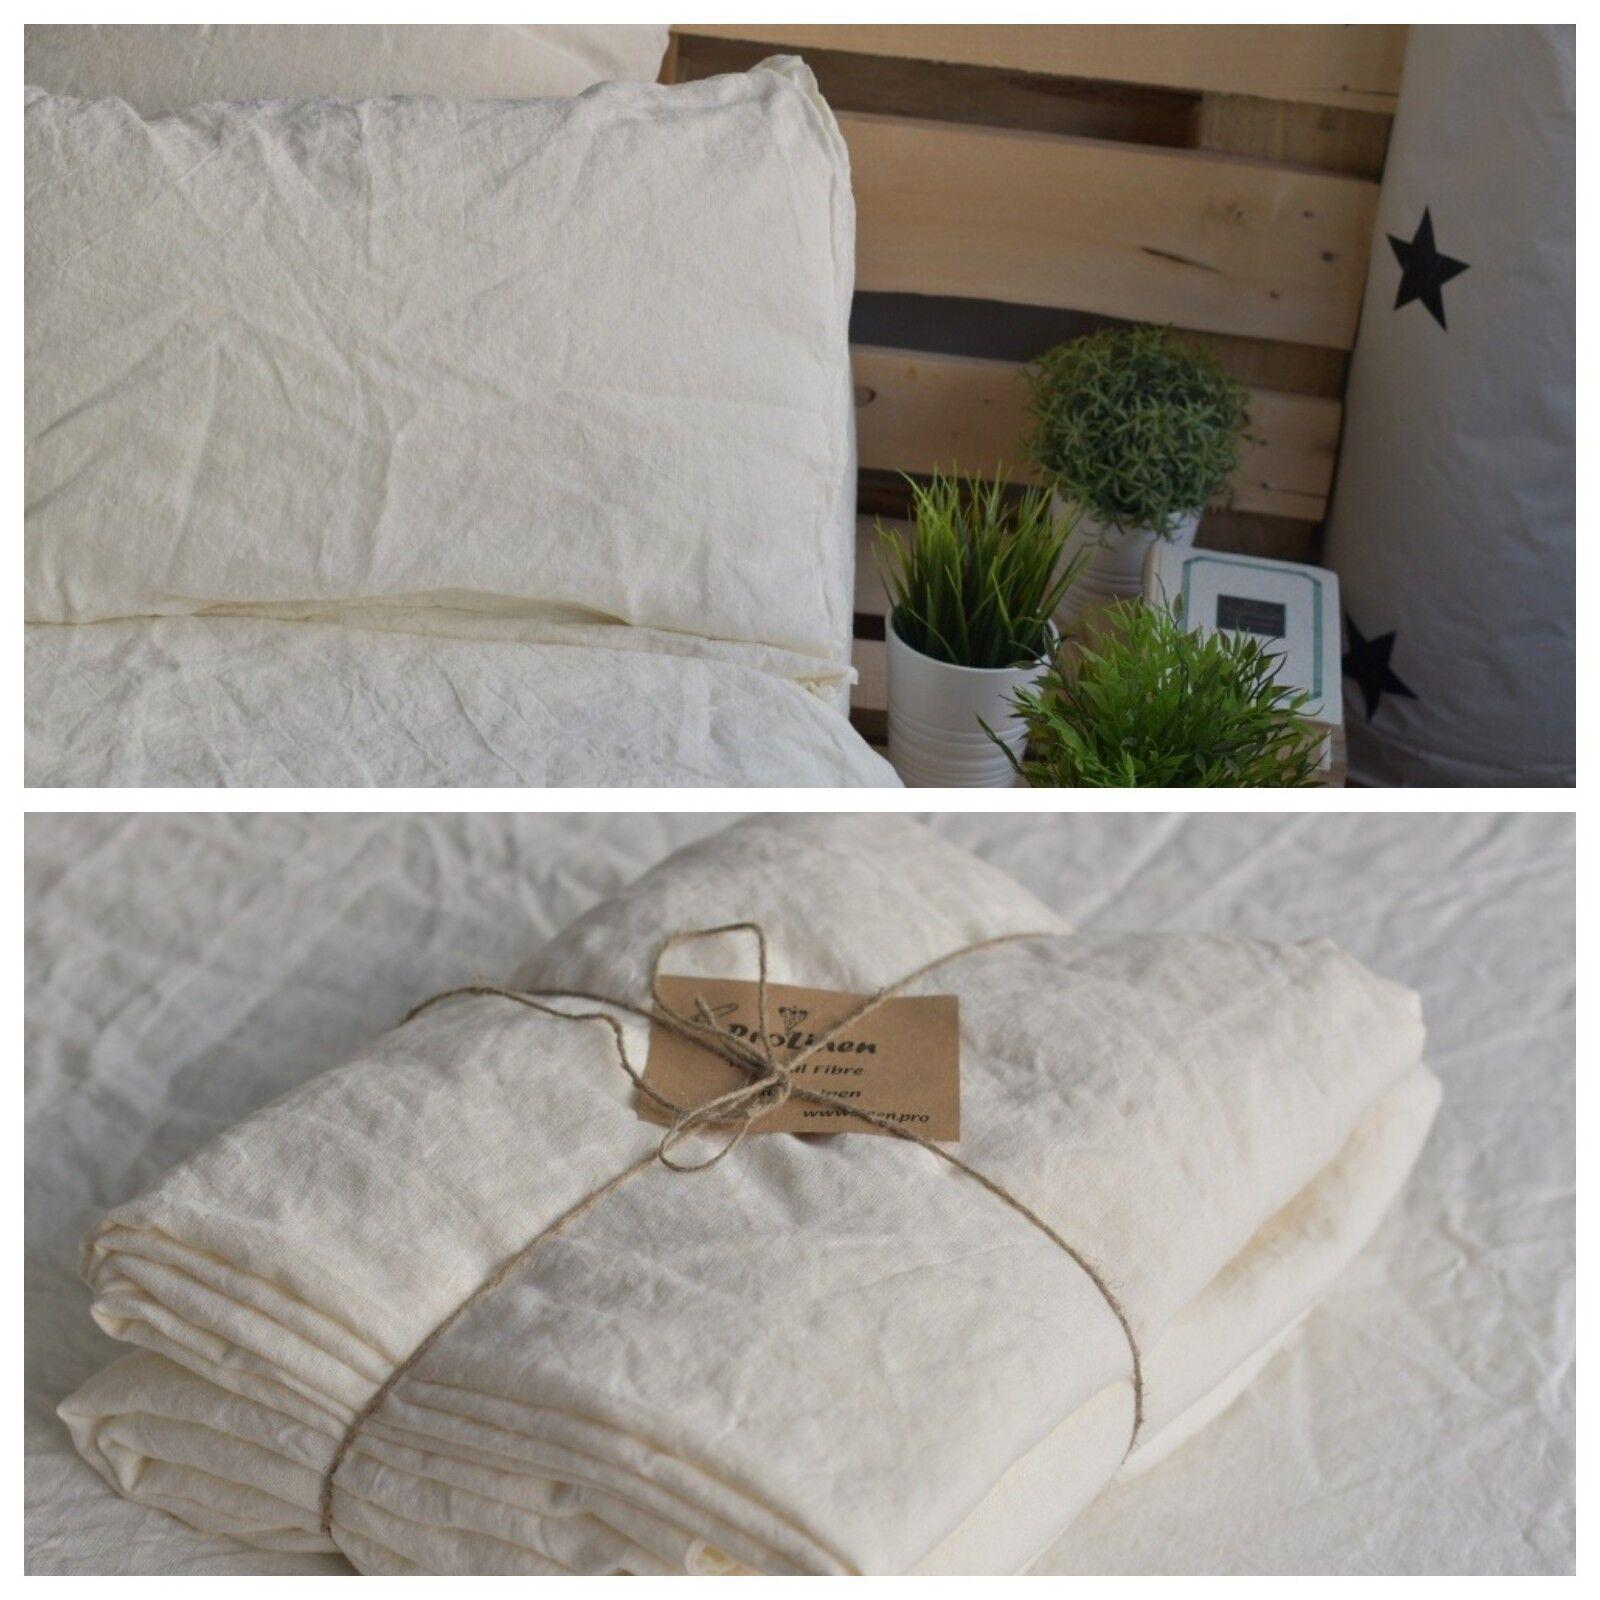 LINEN SHEET SET in Antique Weiß Farbe Queen King Twin linen bedding set Luxury